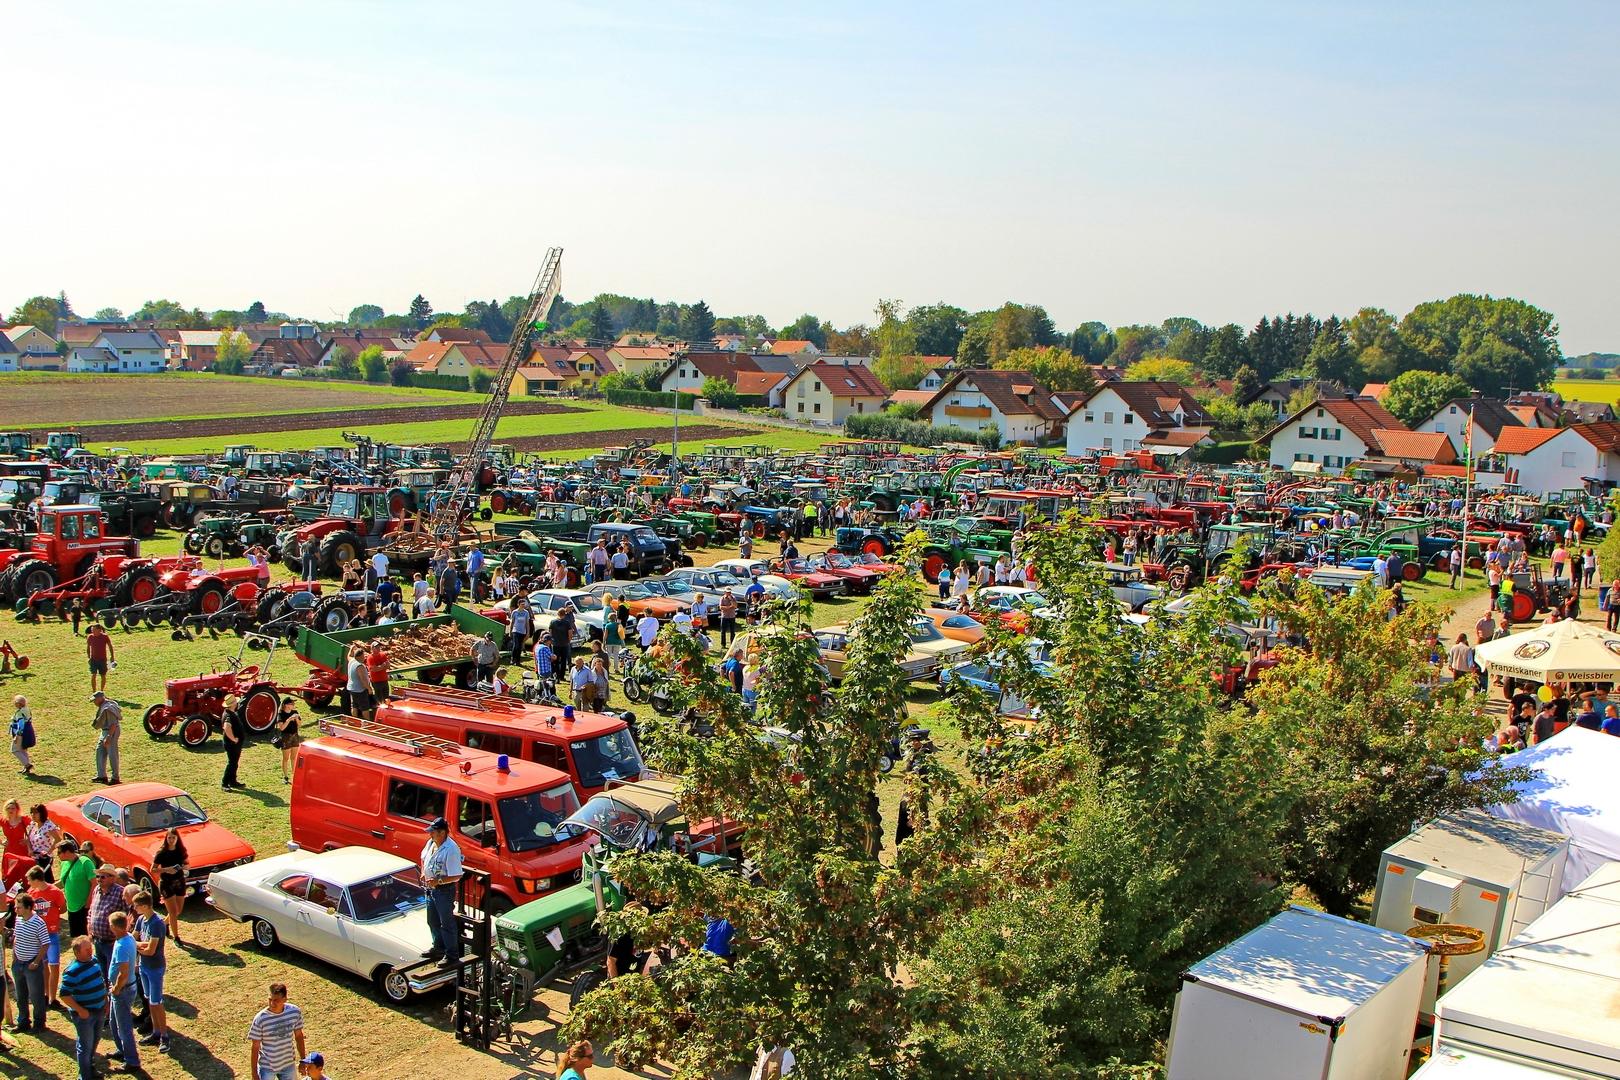 2018_09_14-16 Schleppertreffen Schmiechen  1235